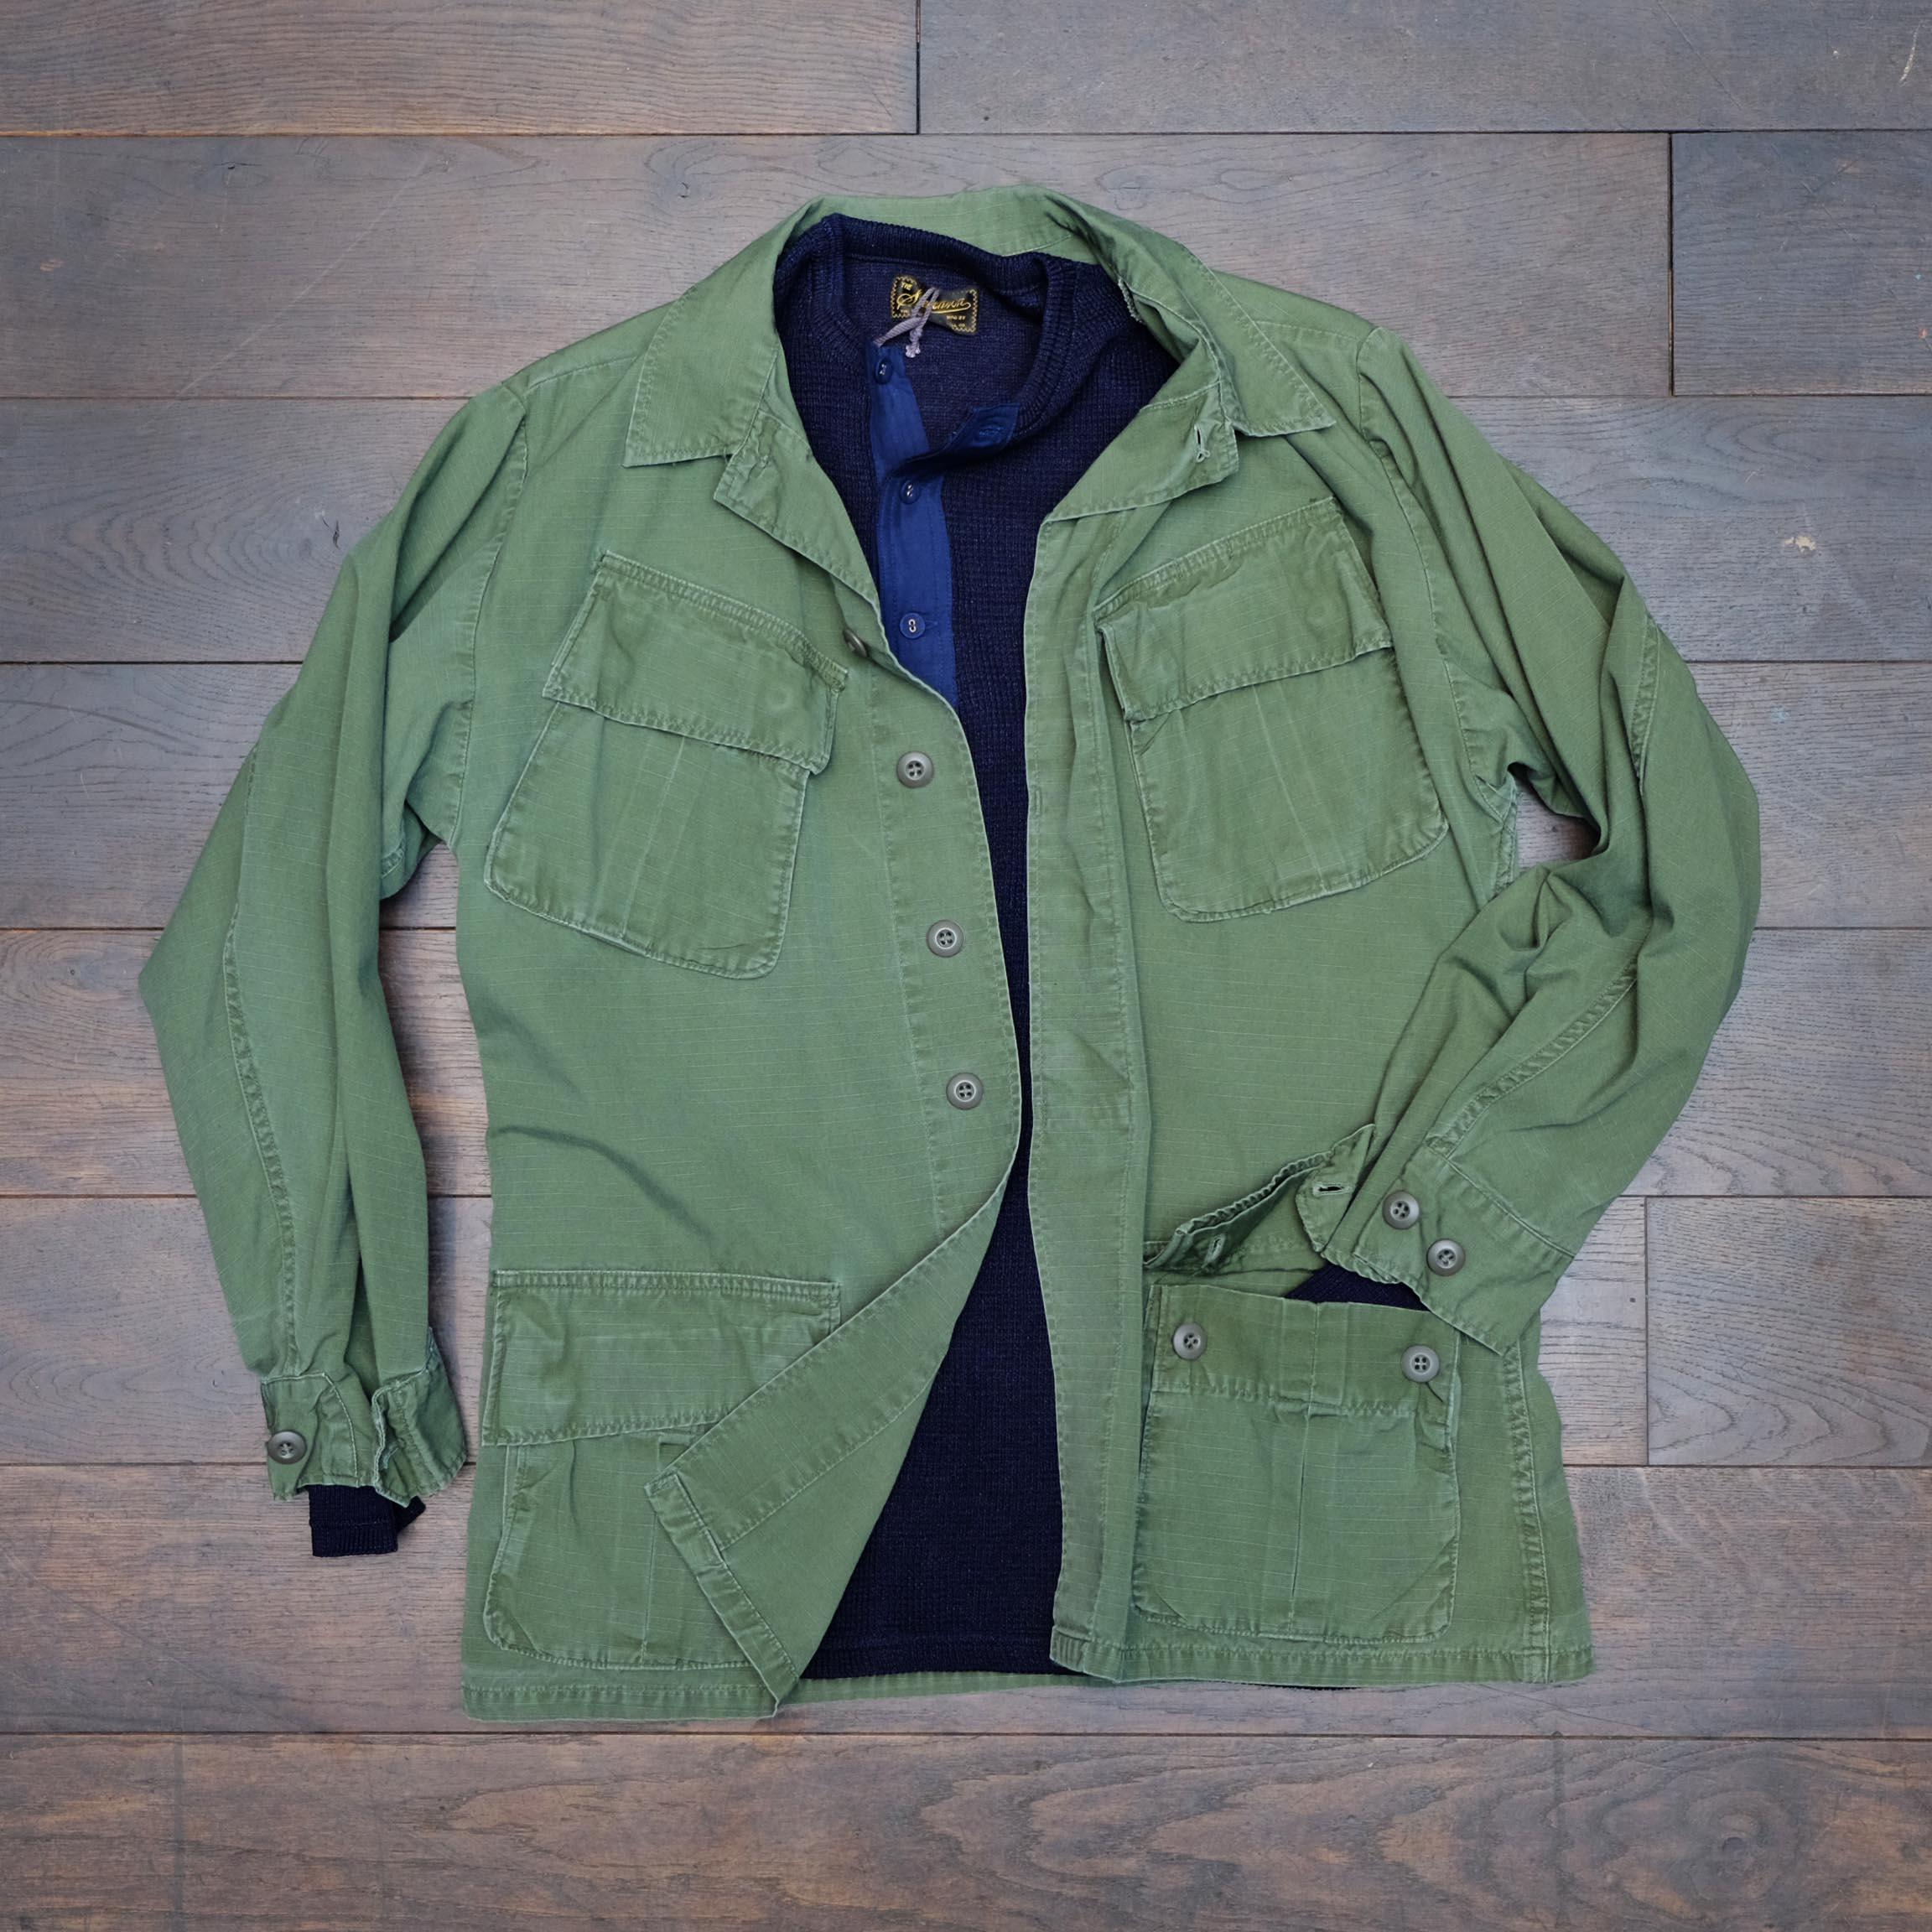 stevenson-overall-henley-indigo-vintage-armyjacke-vietnam-djungle